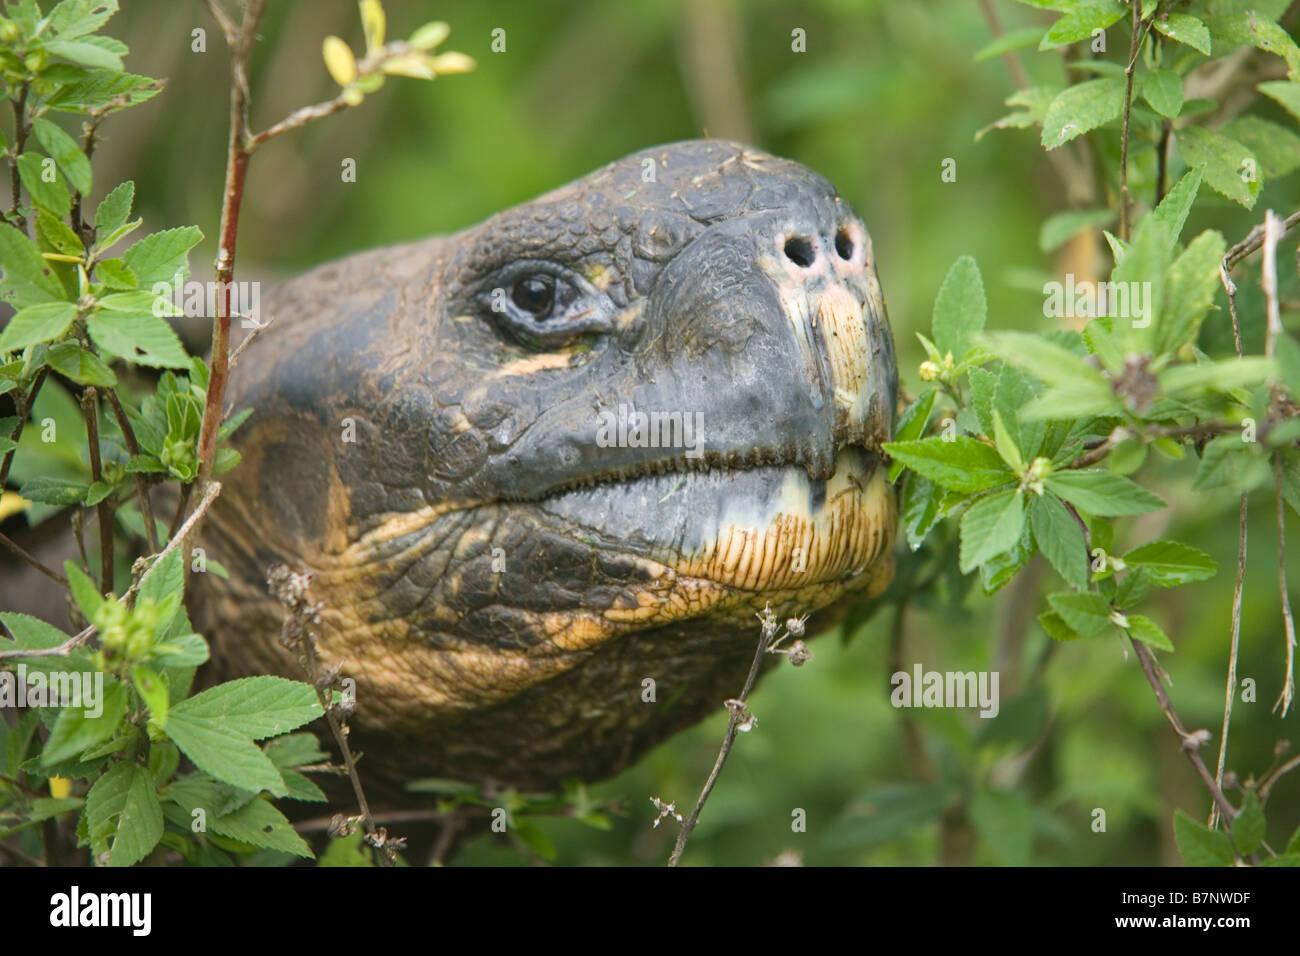 Riesige Schildkröte Kopf, Ecuador Galapagos, Santa Cruz Insel Stockbild